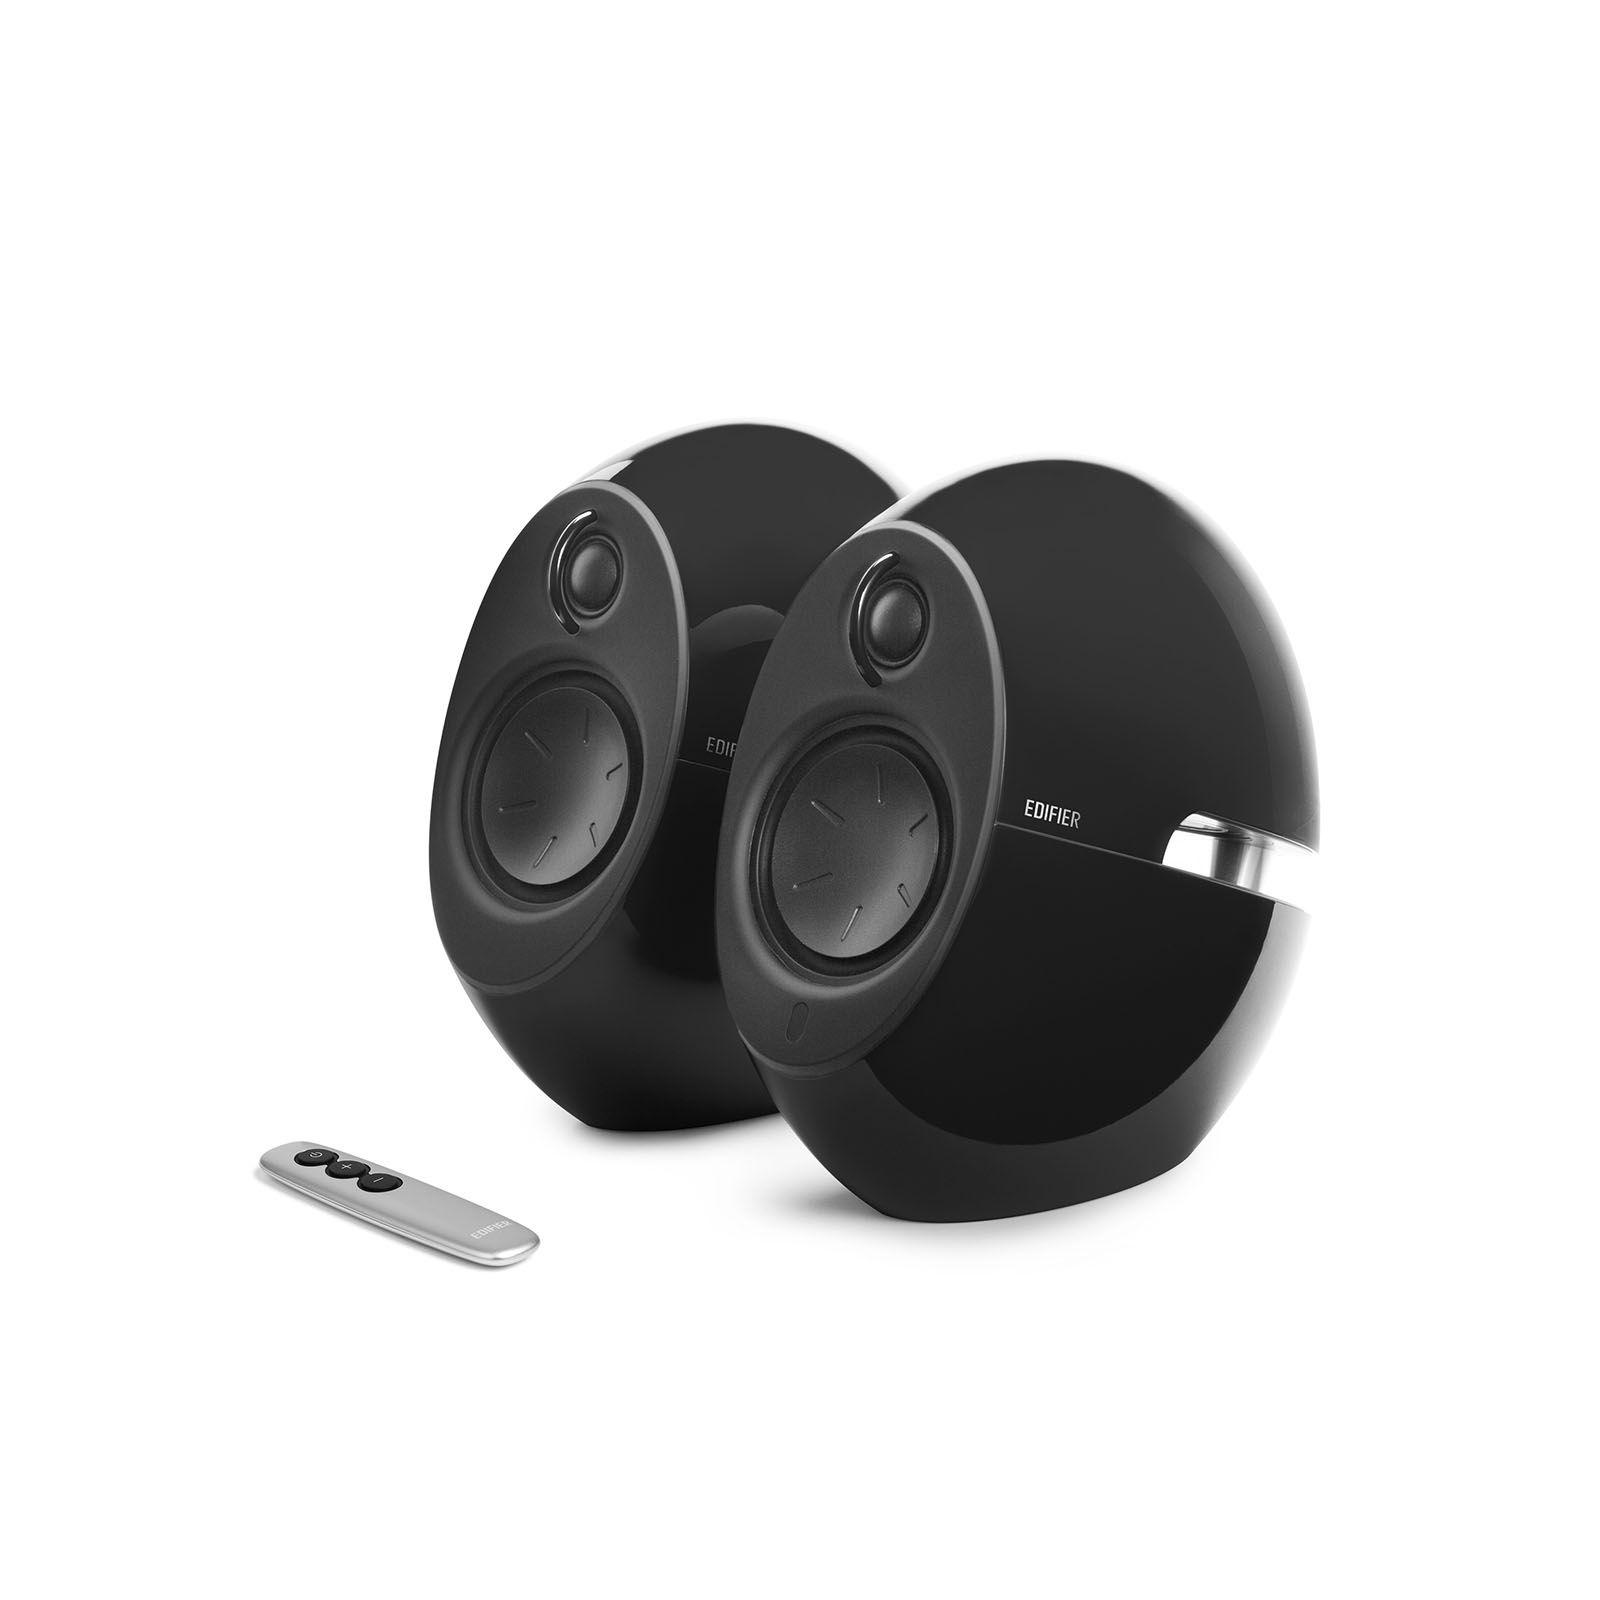 E25hd Luna Hd Bluetooth Wireless Optical Tv Speakers Bluetooth Speakers Bluetooth Speakers Portable Bluetooth